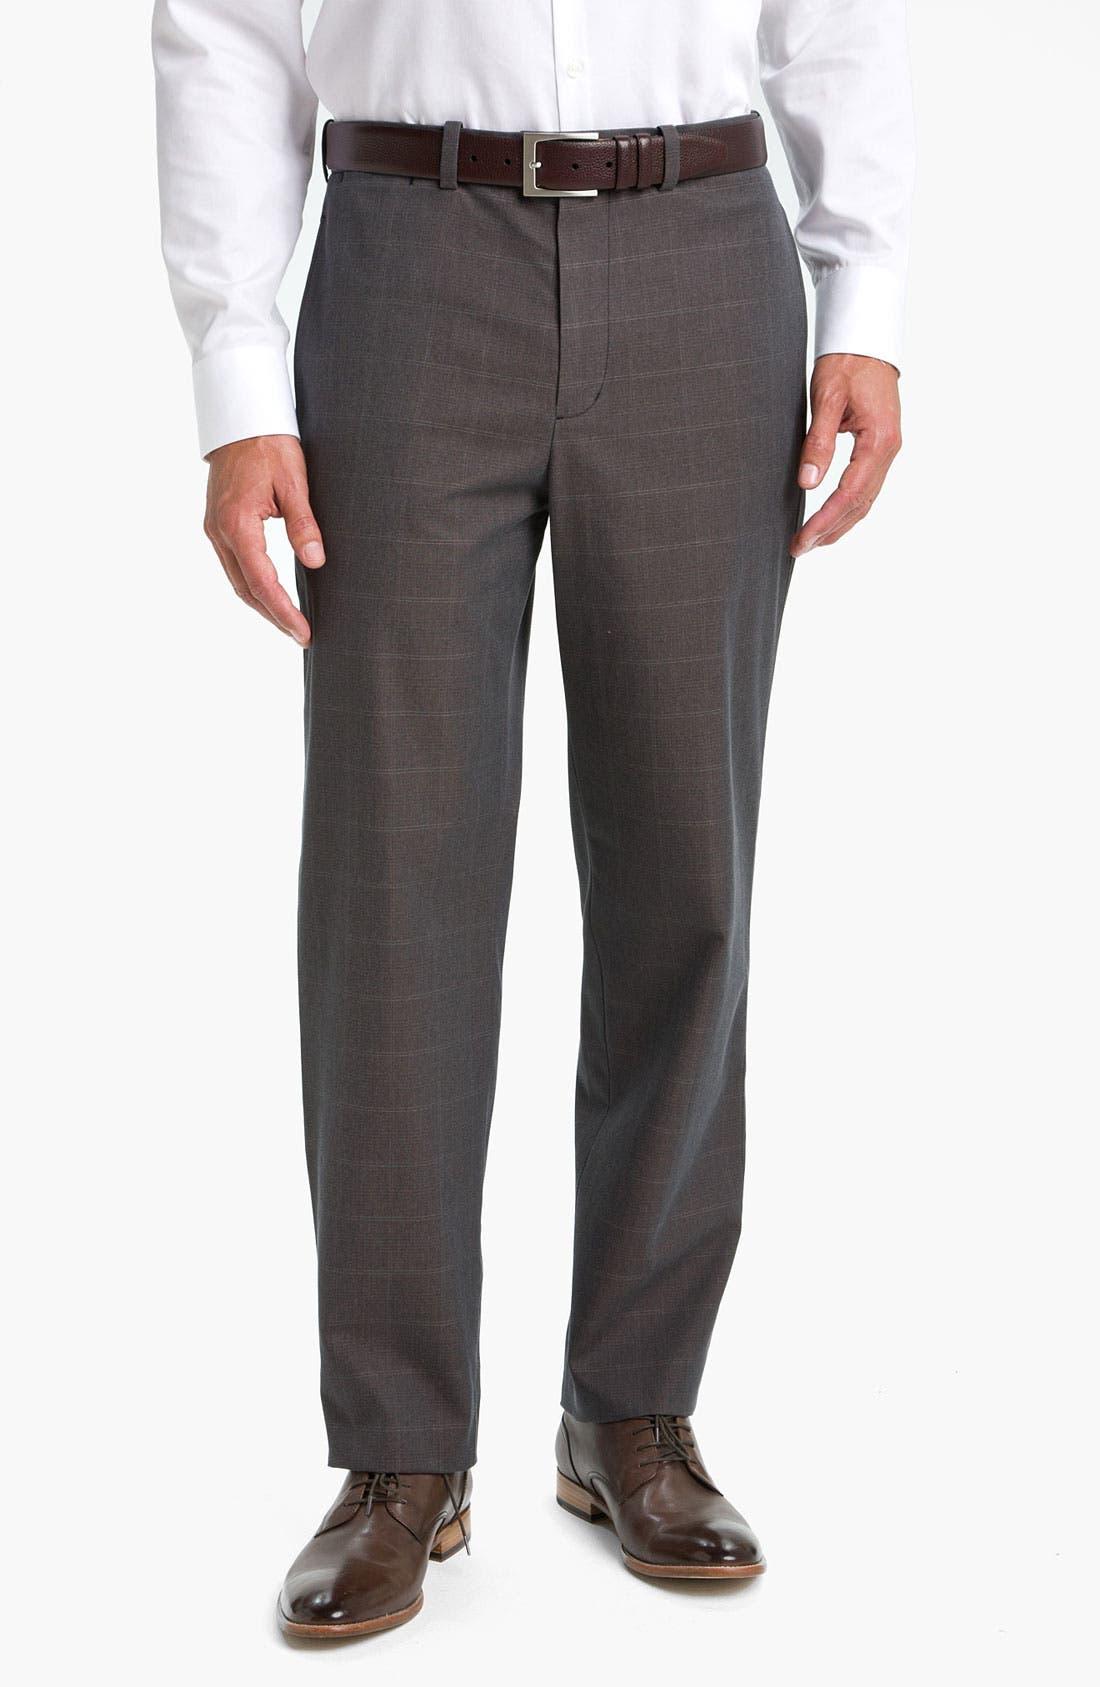 Main Image - John W. Nordstrom® Smartcare™ Supima® Cotton Pants